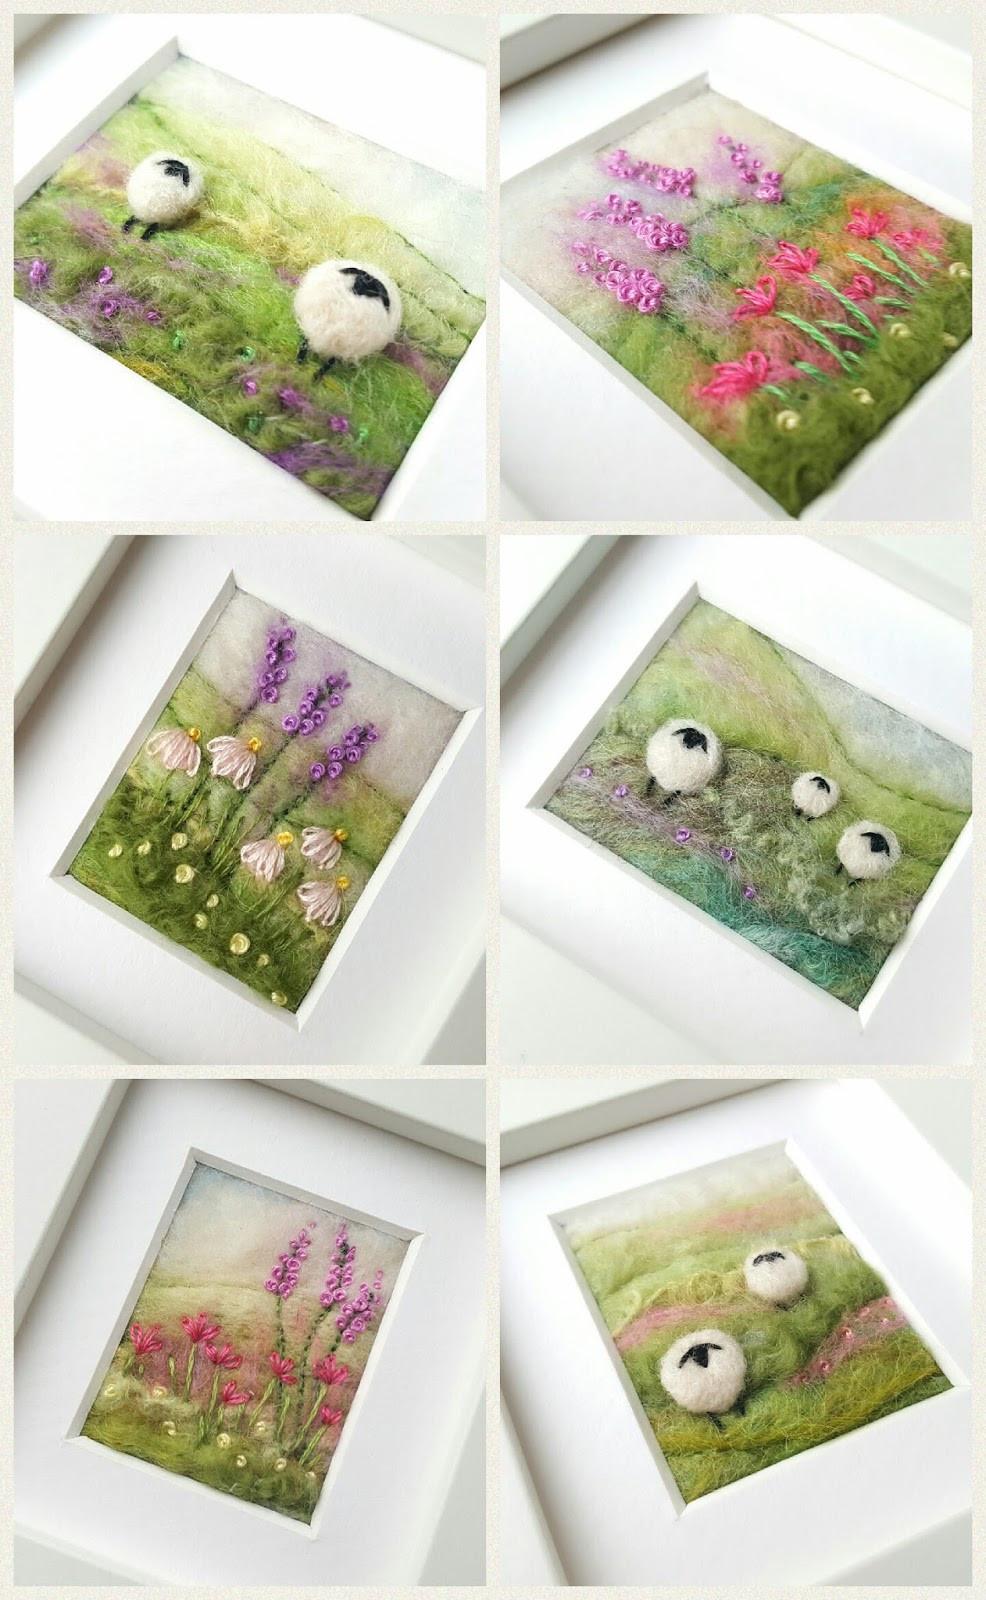 tilly tea dance - Felted sheep images